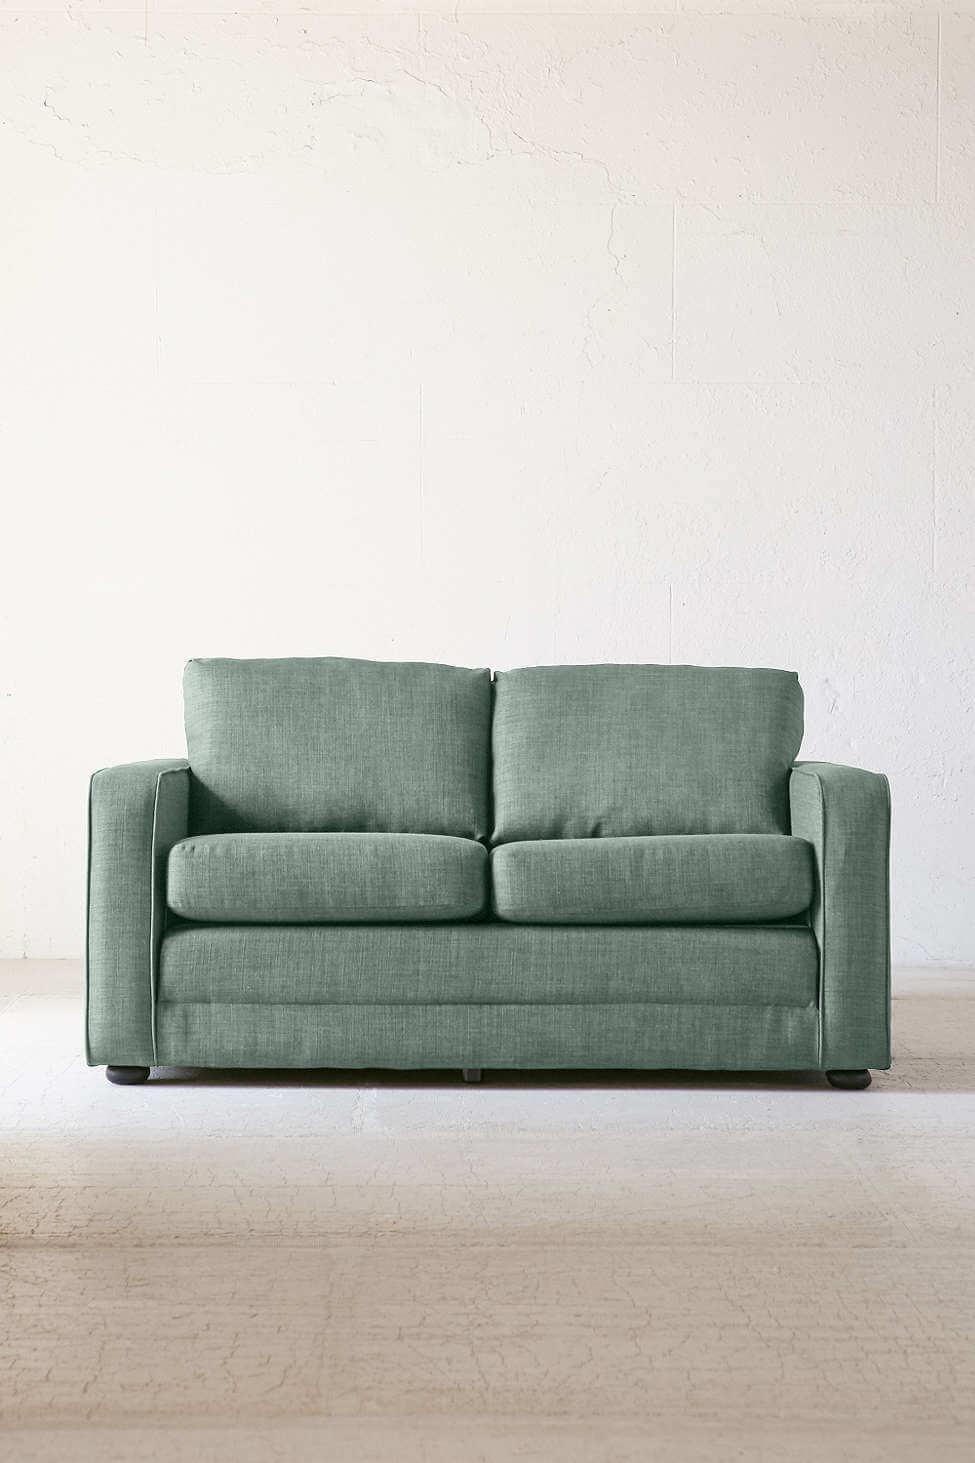 color-crush-seafoam-green-blog-sofa